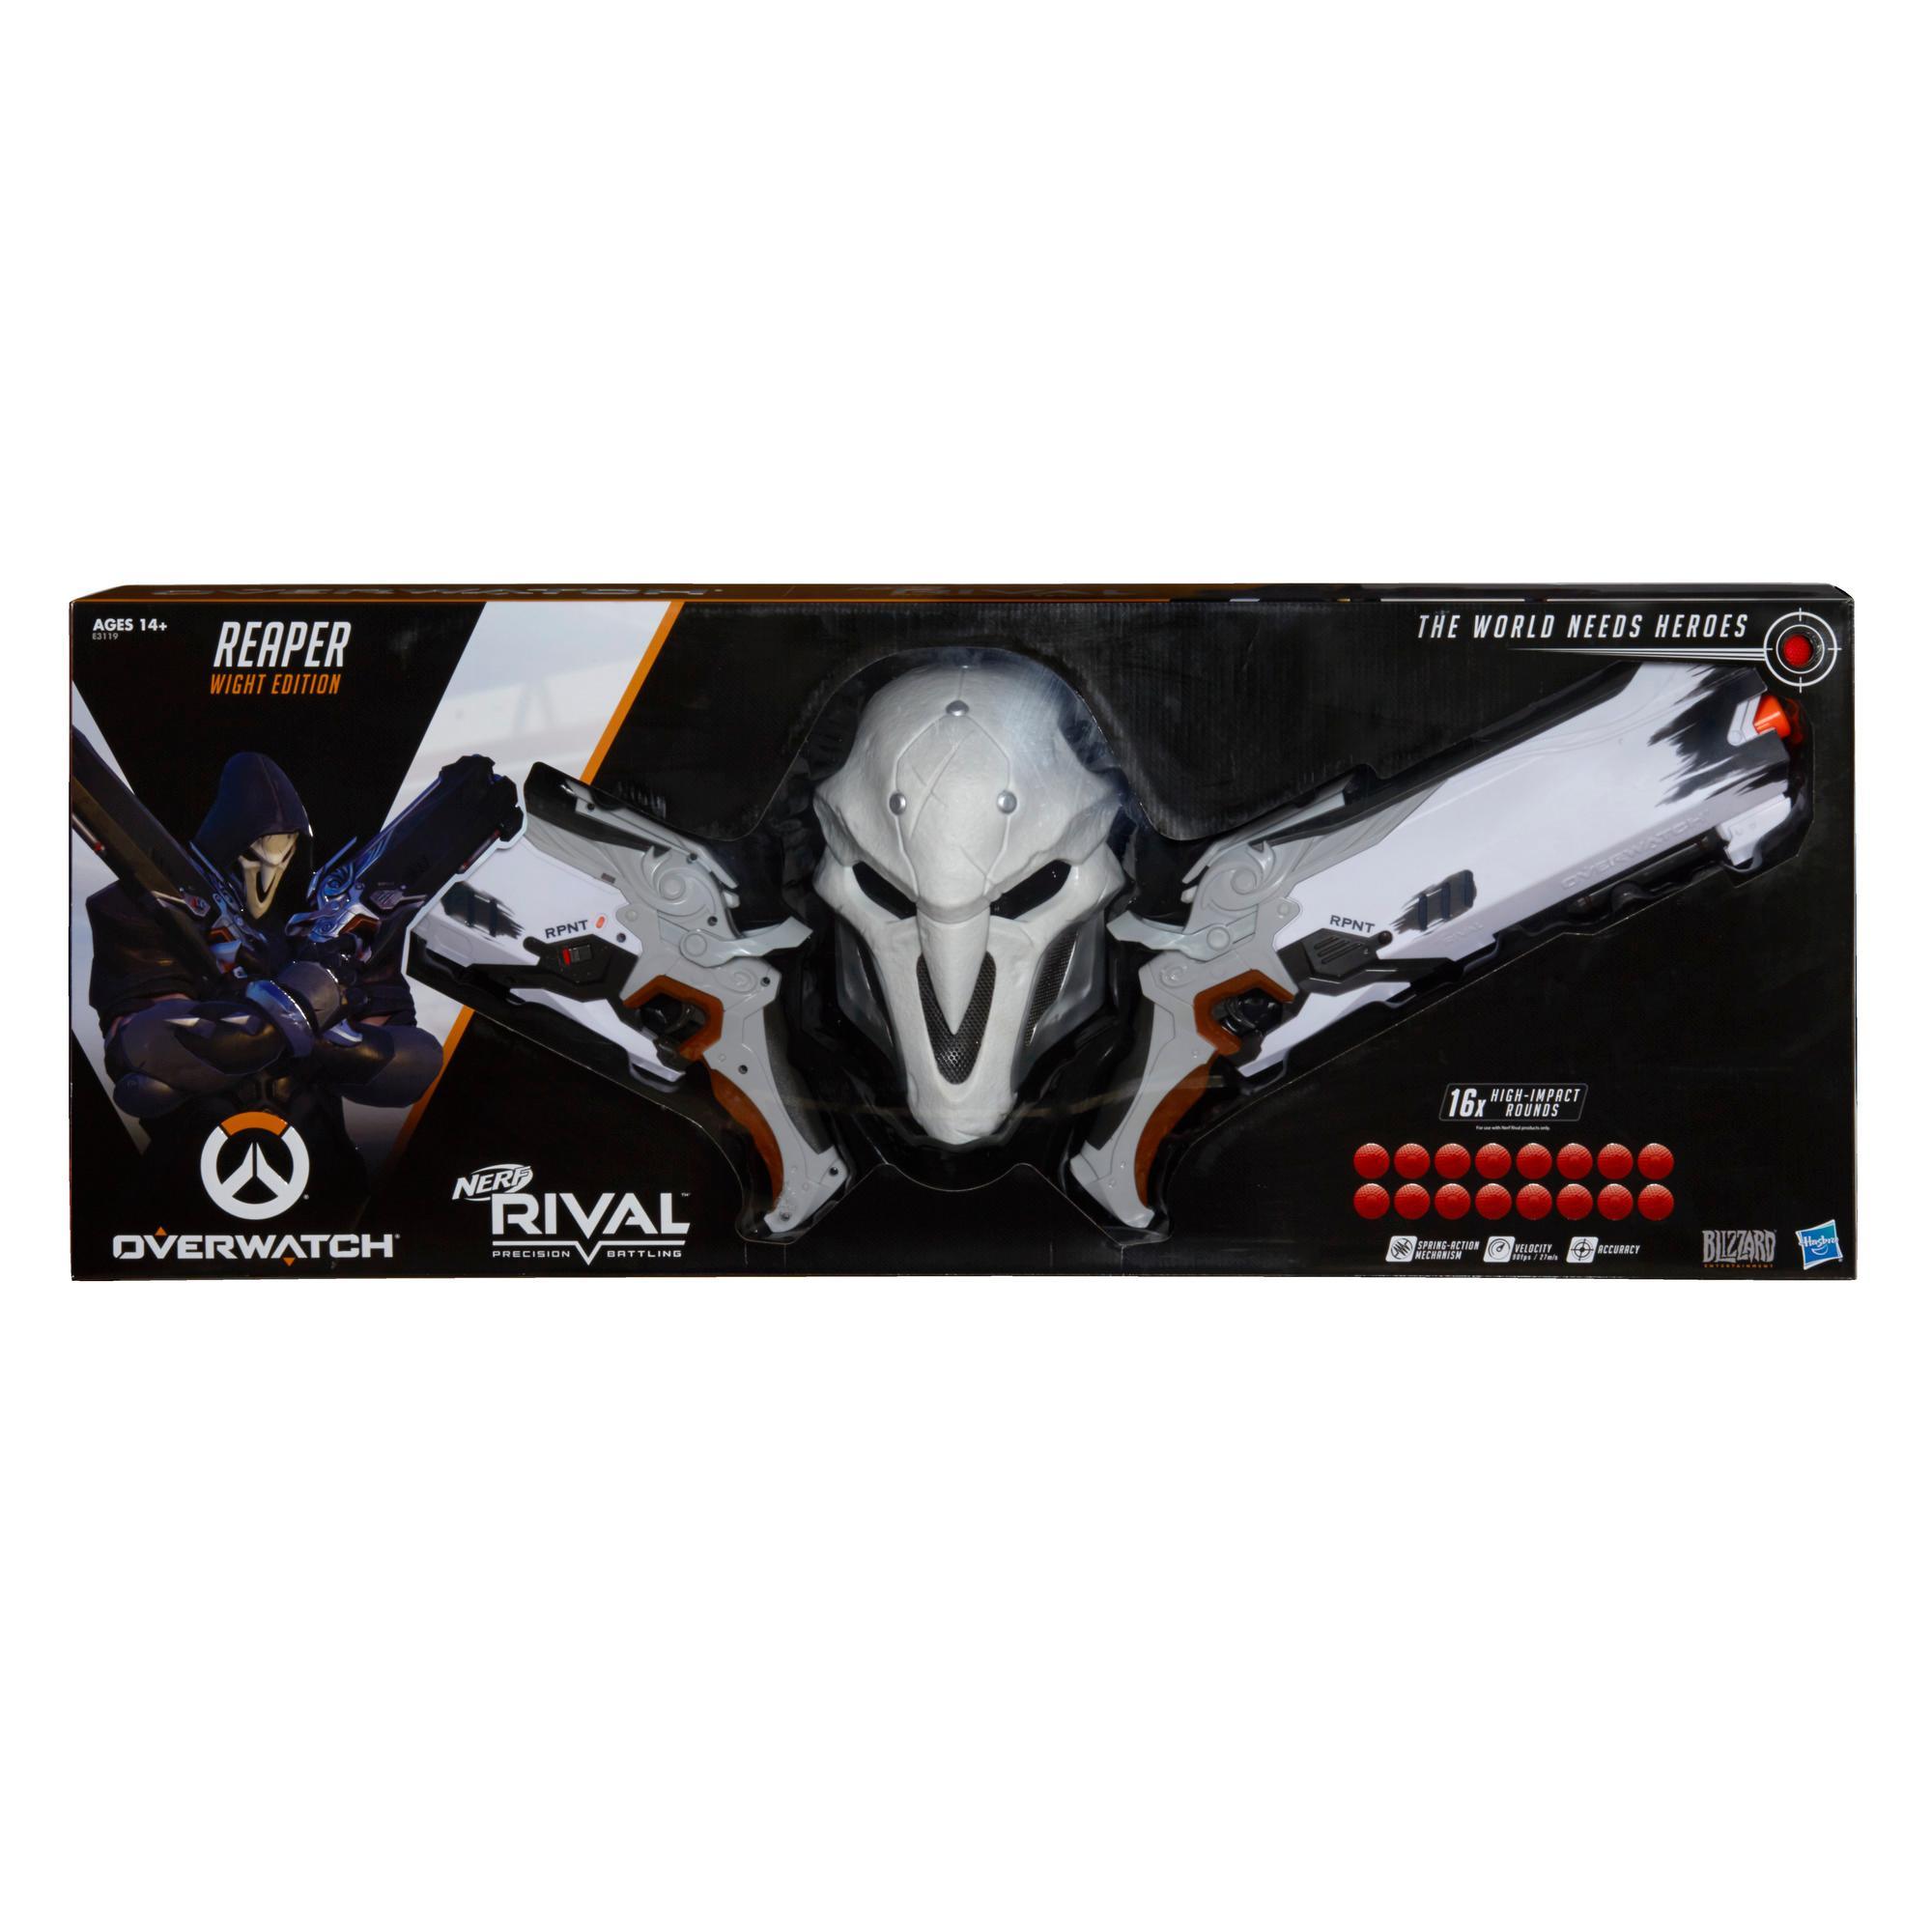 Overwatch Reaper (edición Criatura) Empaque de colección